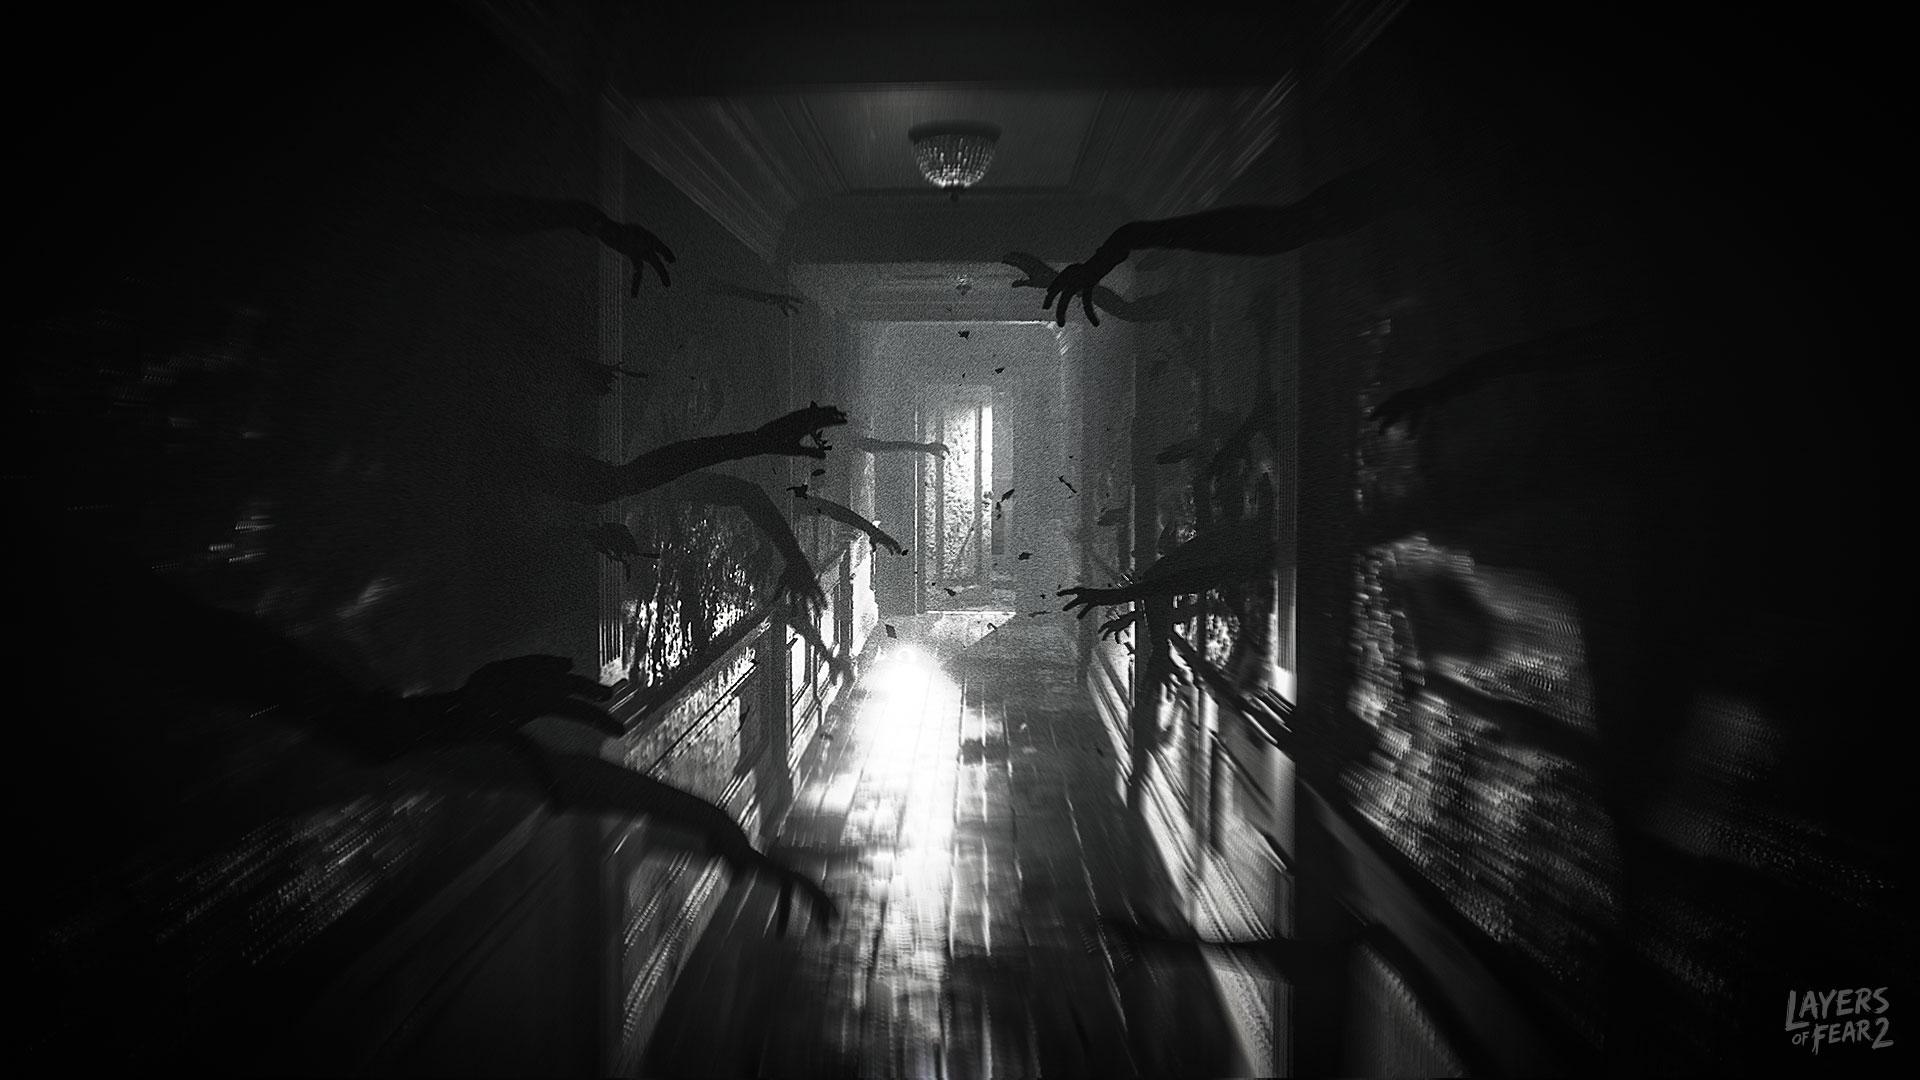 el-bloober-team-anuncia-layers-of-fear-2-frikigamers.com